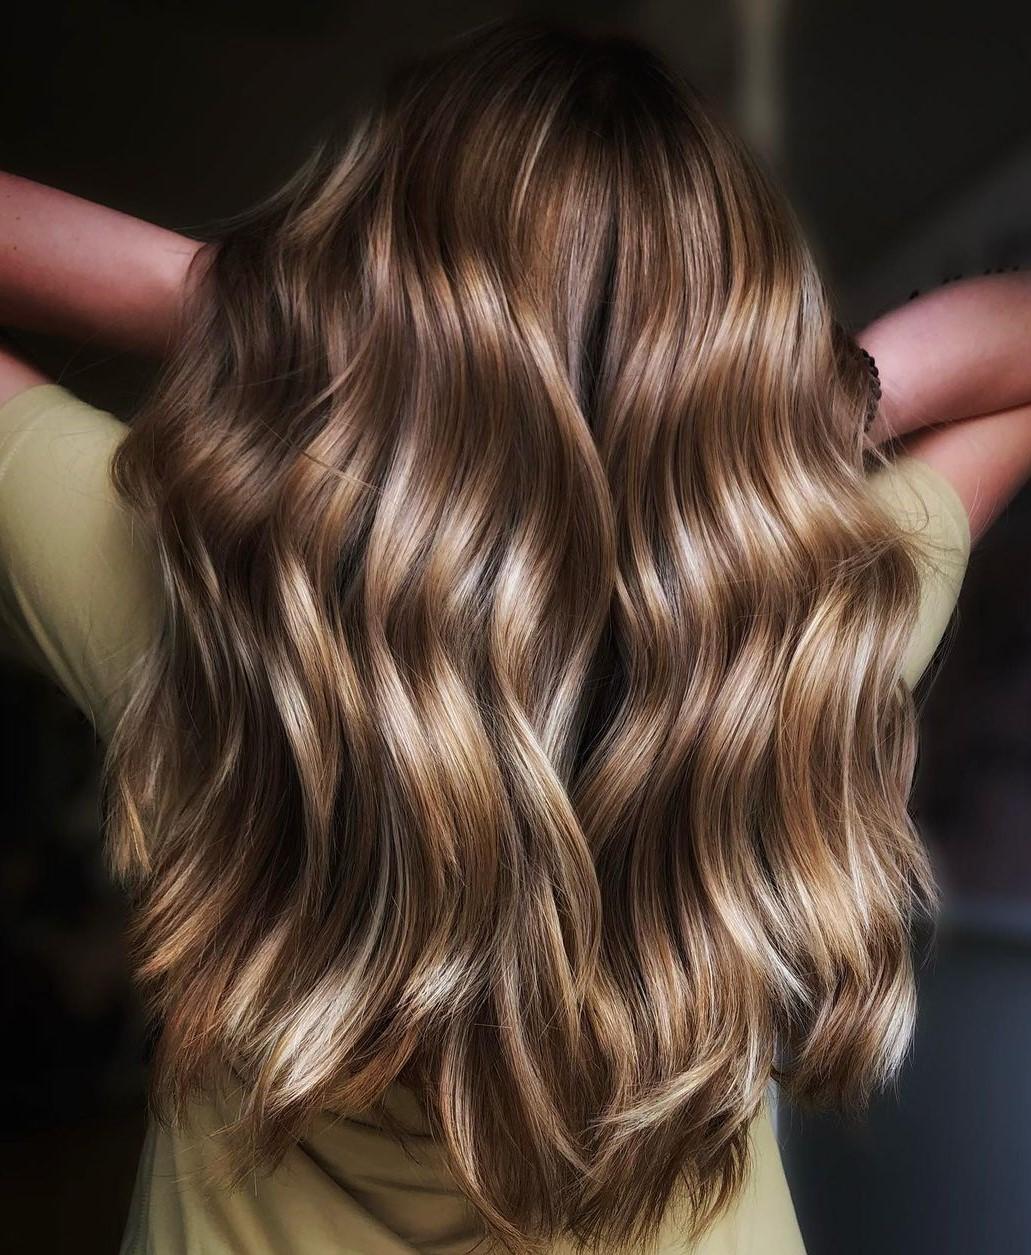 Medium-Length Dark Honey Blonde Balayage